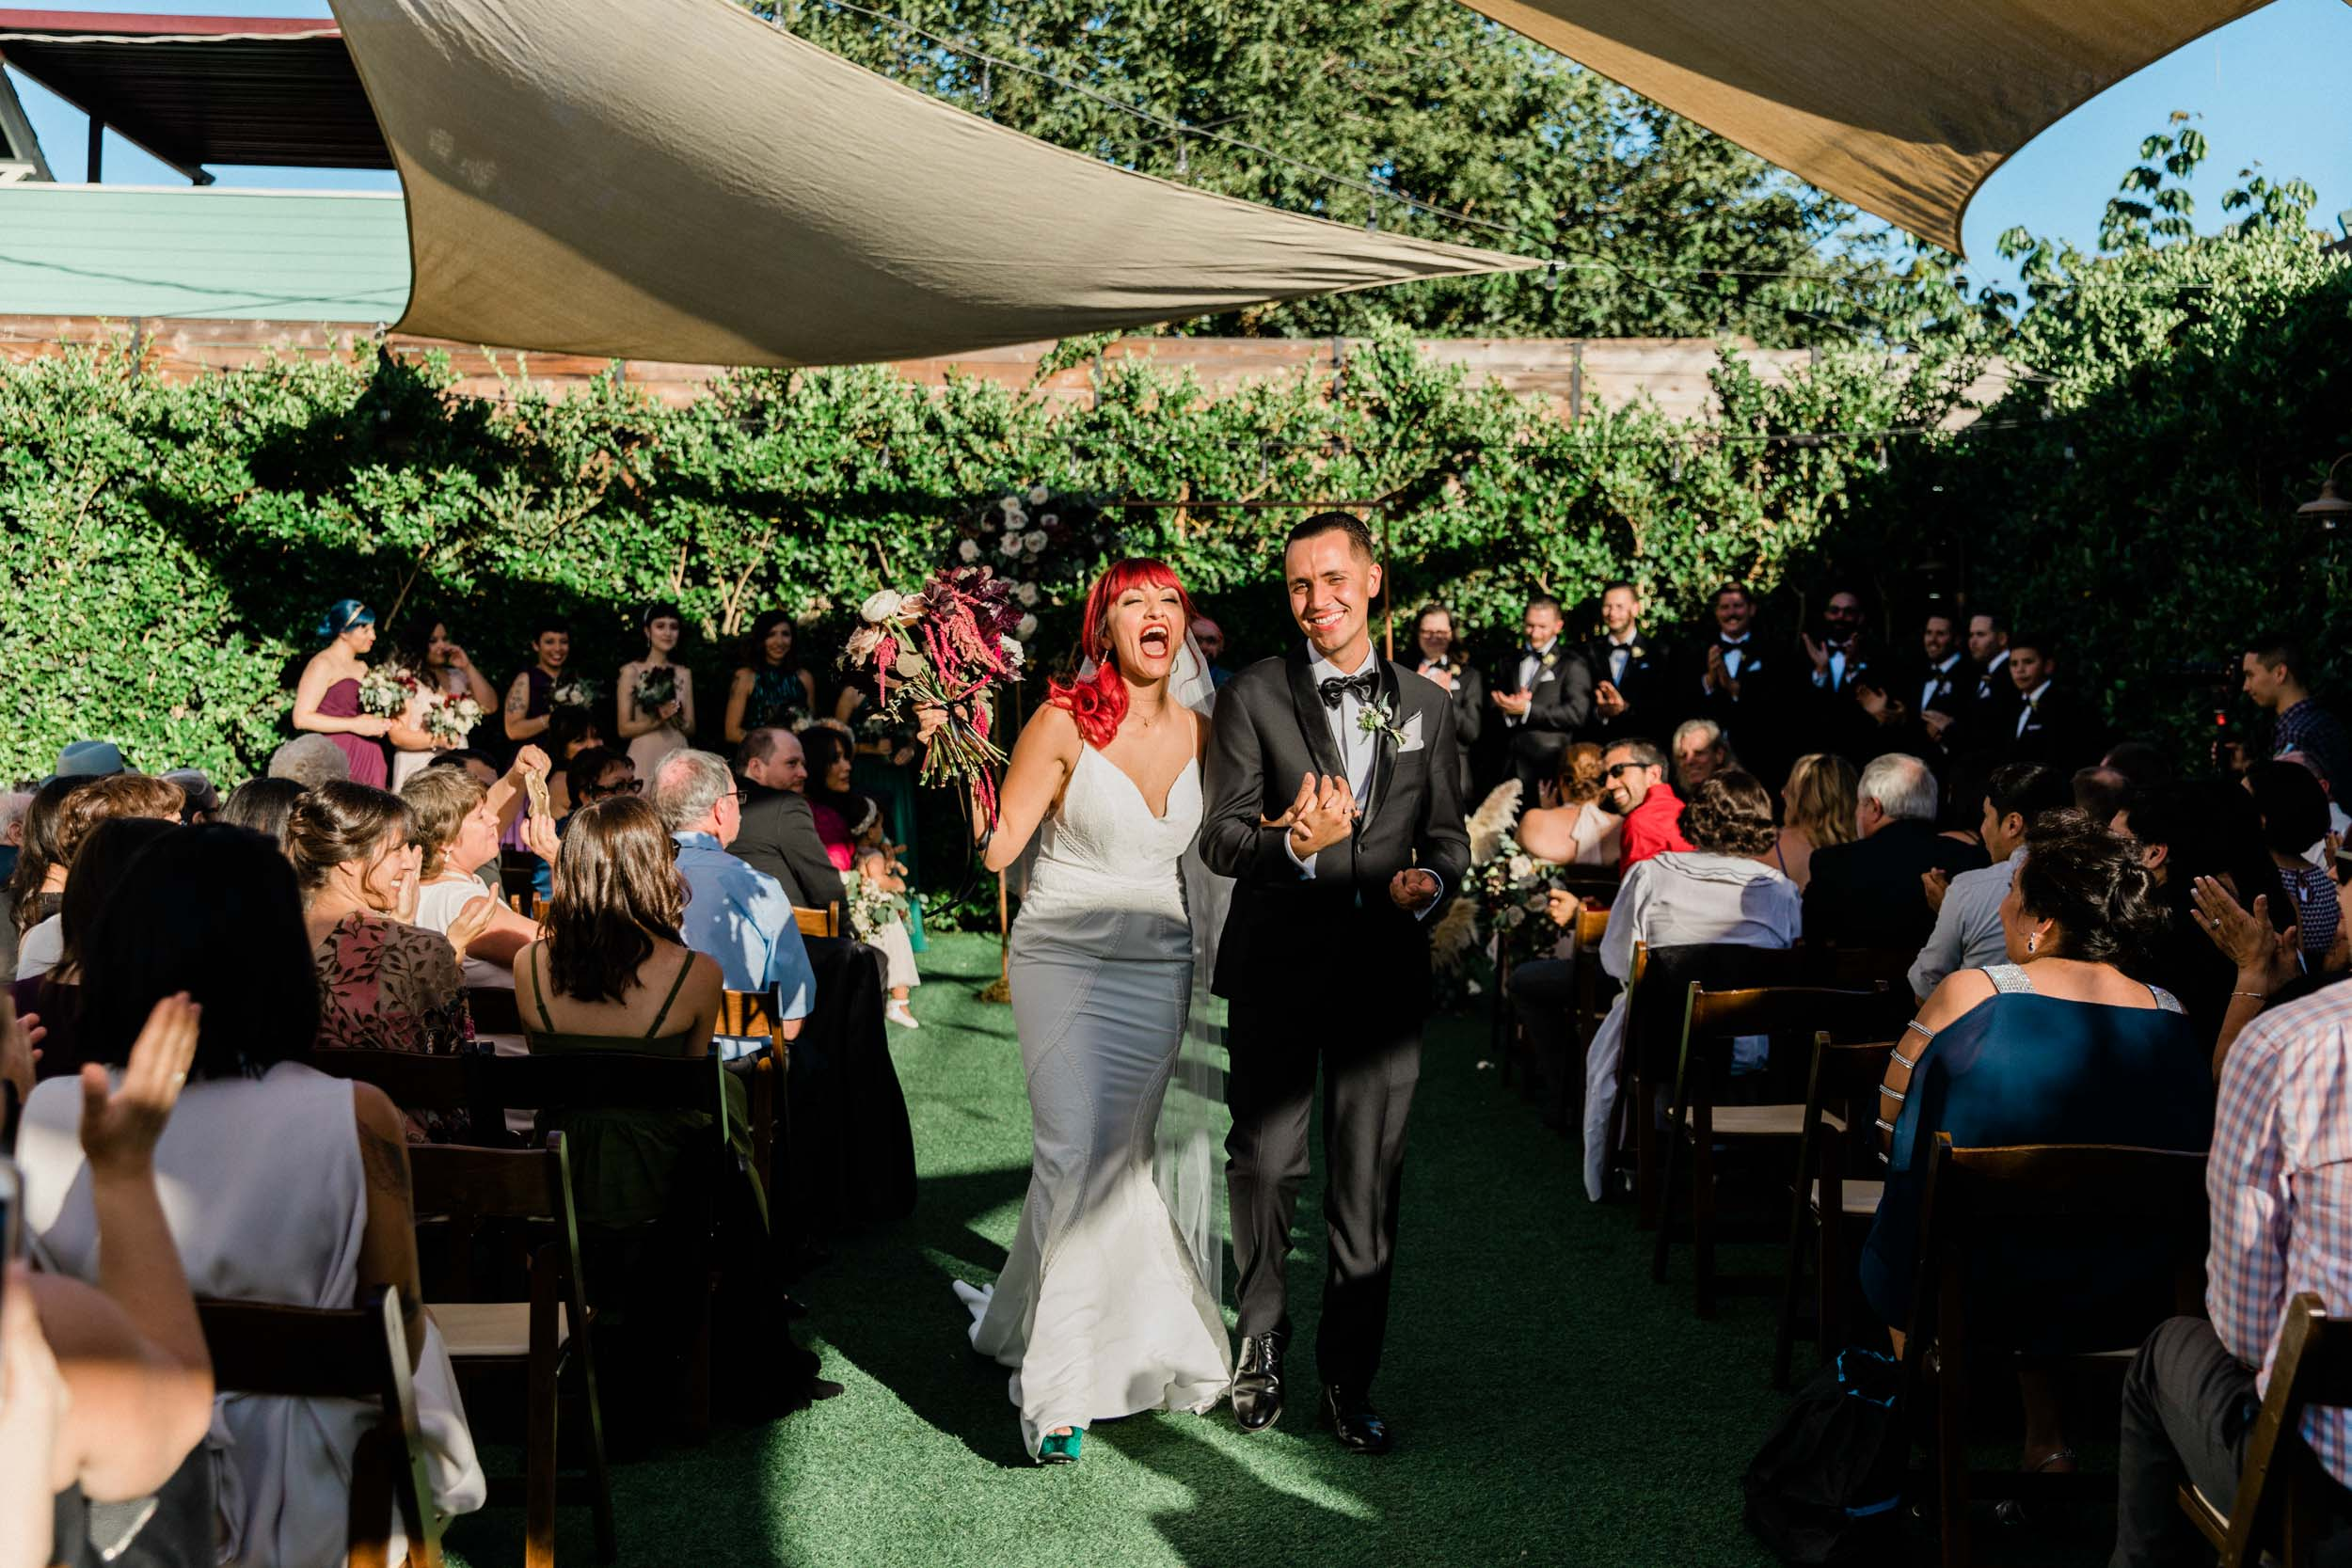 BKM-Photography-Los-Angeles-Highland-Park-York-Manor-Wedding-Photography-0732.jpg